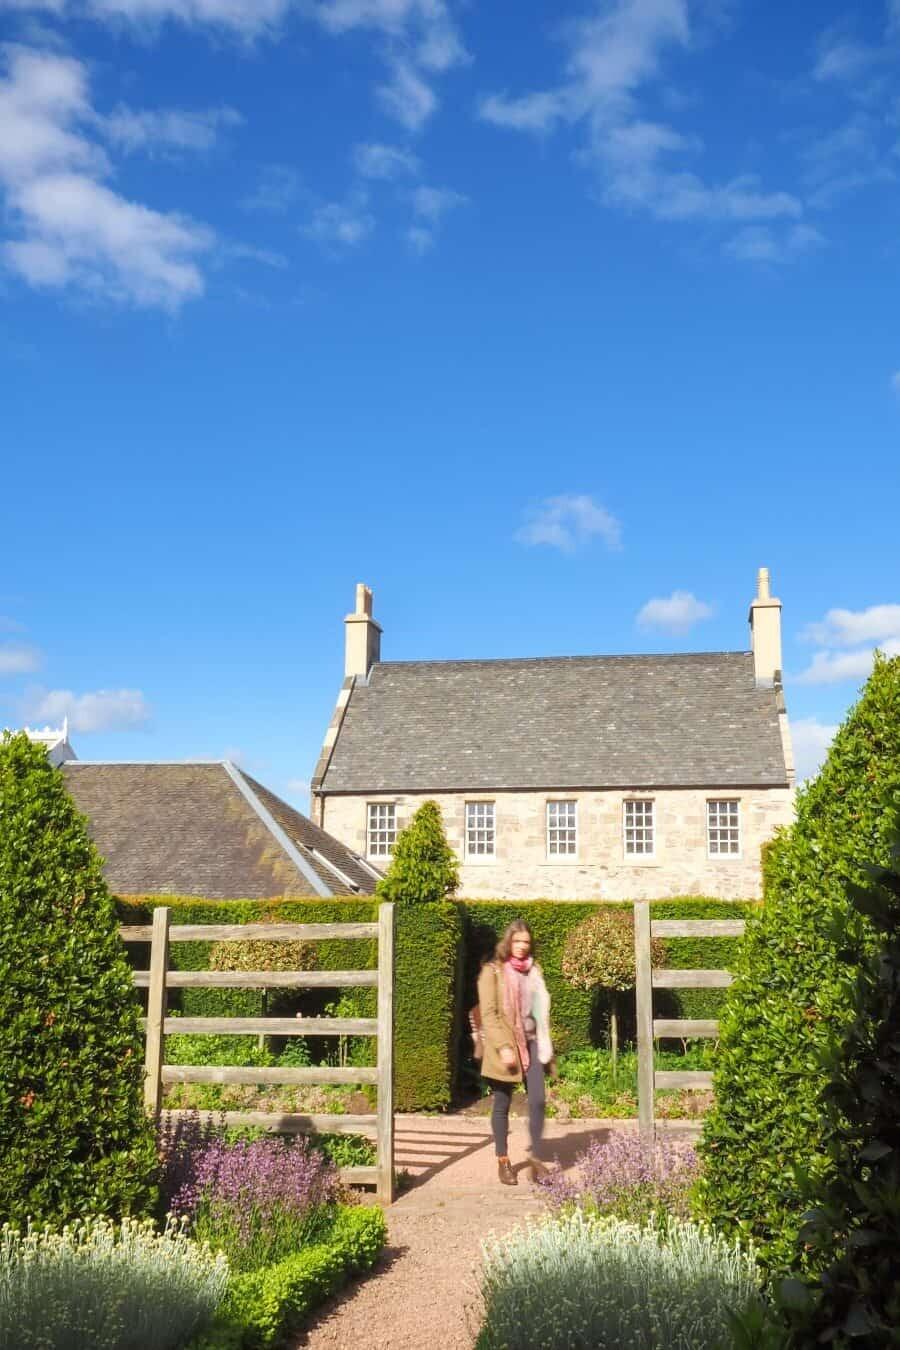 Edinburgh Photography Locations - The Best Photo Locations